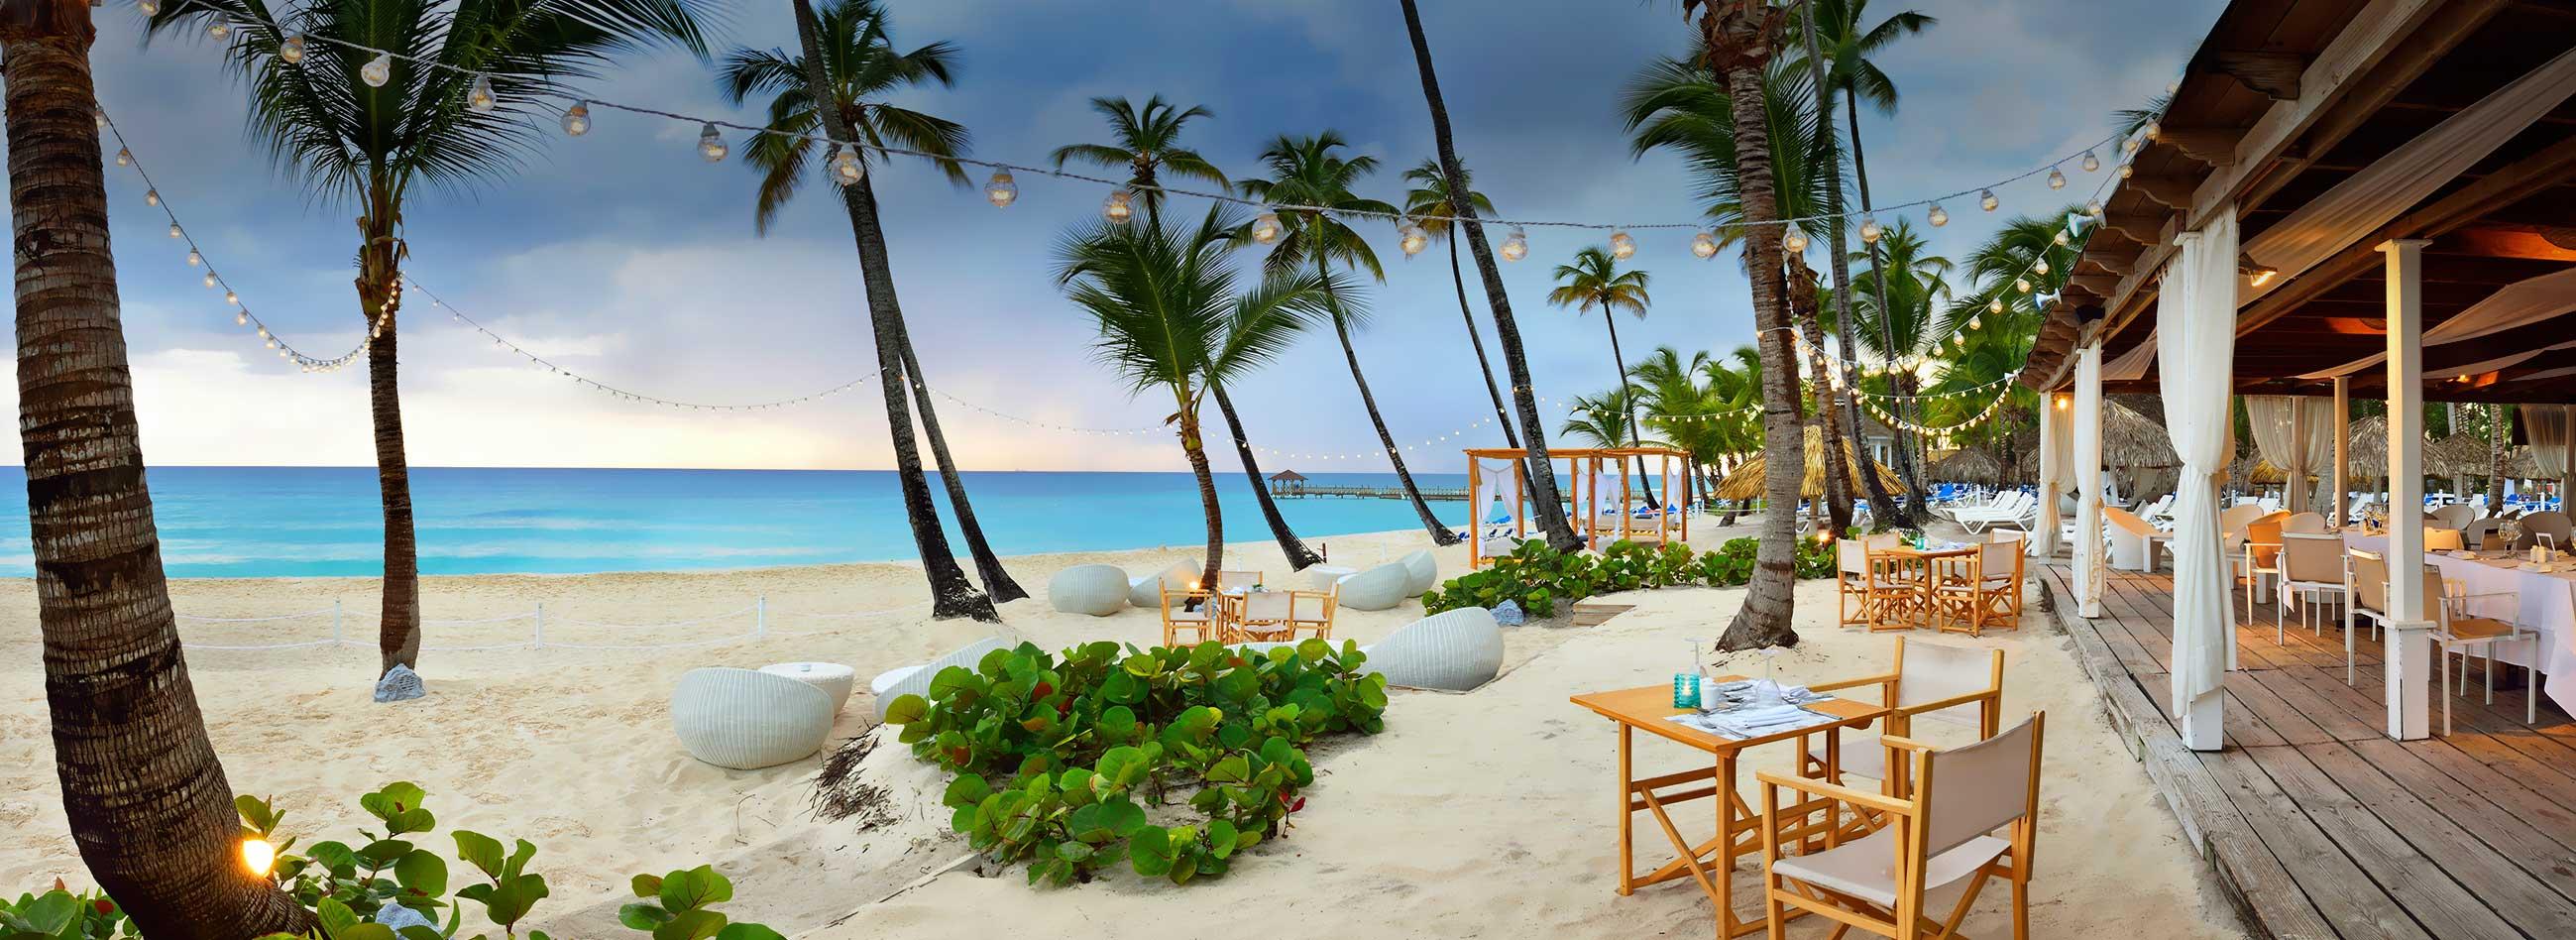 hotel catalonia bavaro beach golf & casino resort dominikanische republik